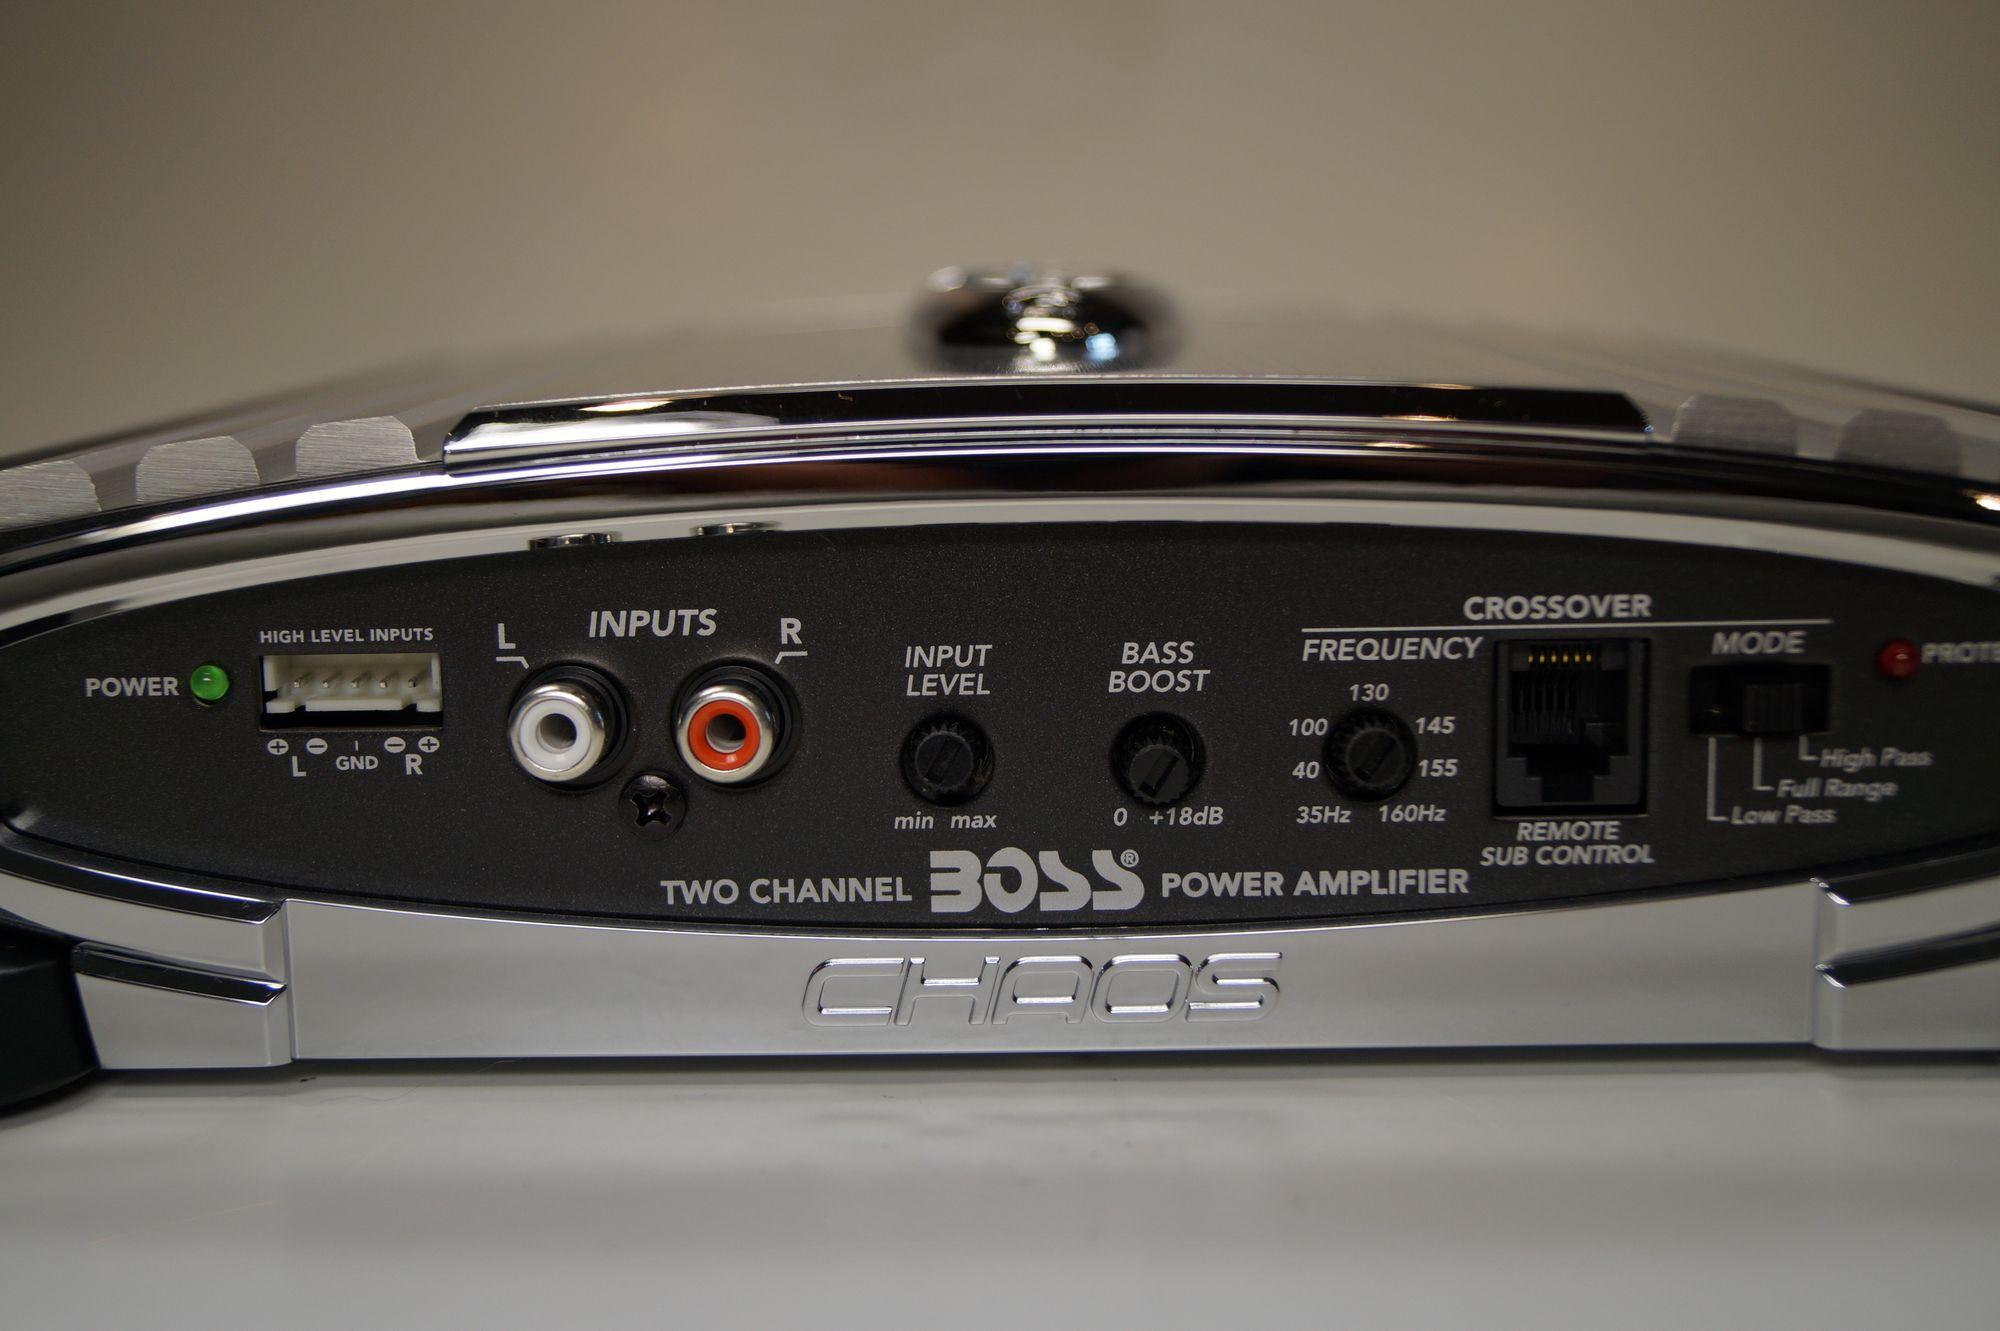 Boss Audio Systems CH450 2 Kanal Endstufe Auto Verstärker 1 Stück 600W  – Bild 3